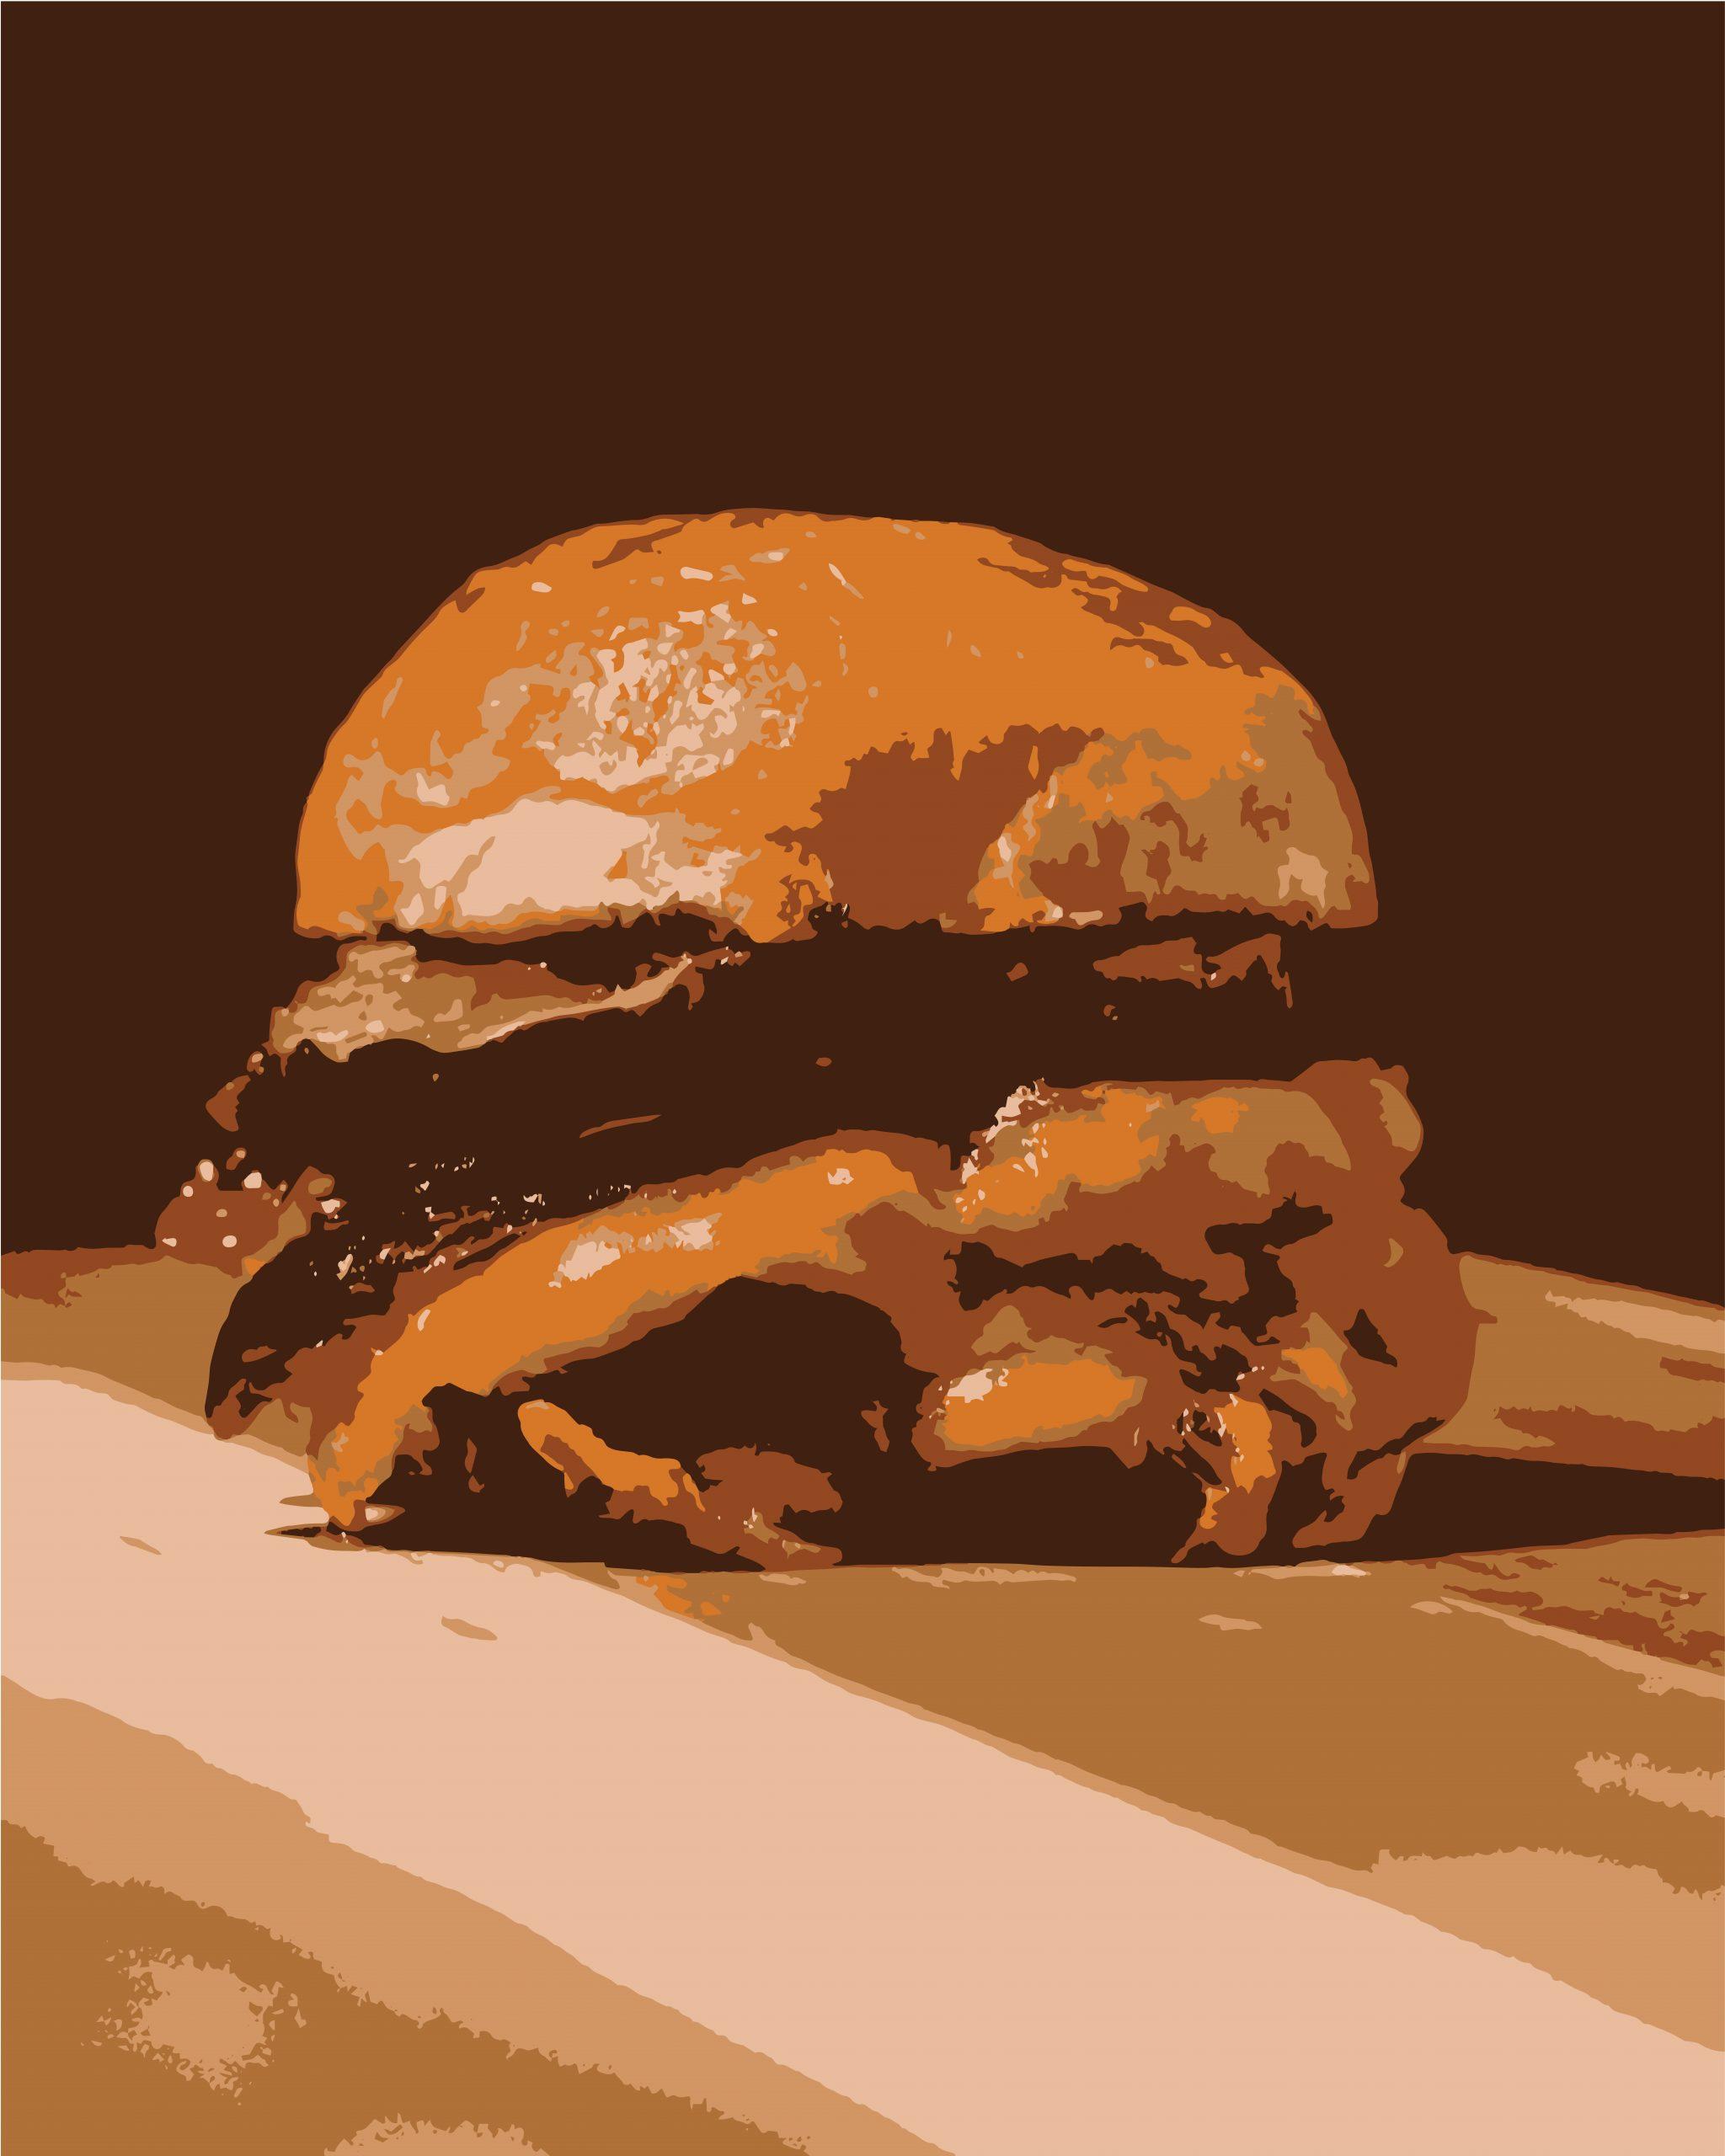 Illustrations of burger